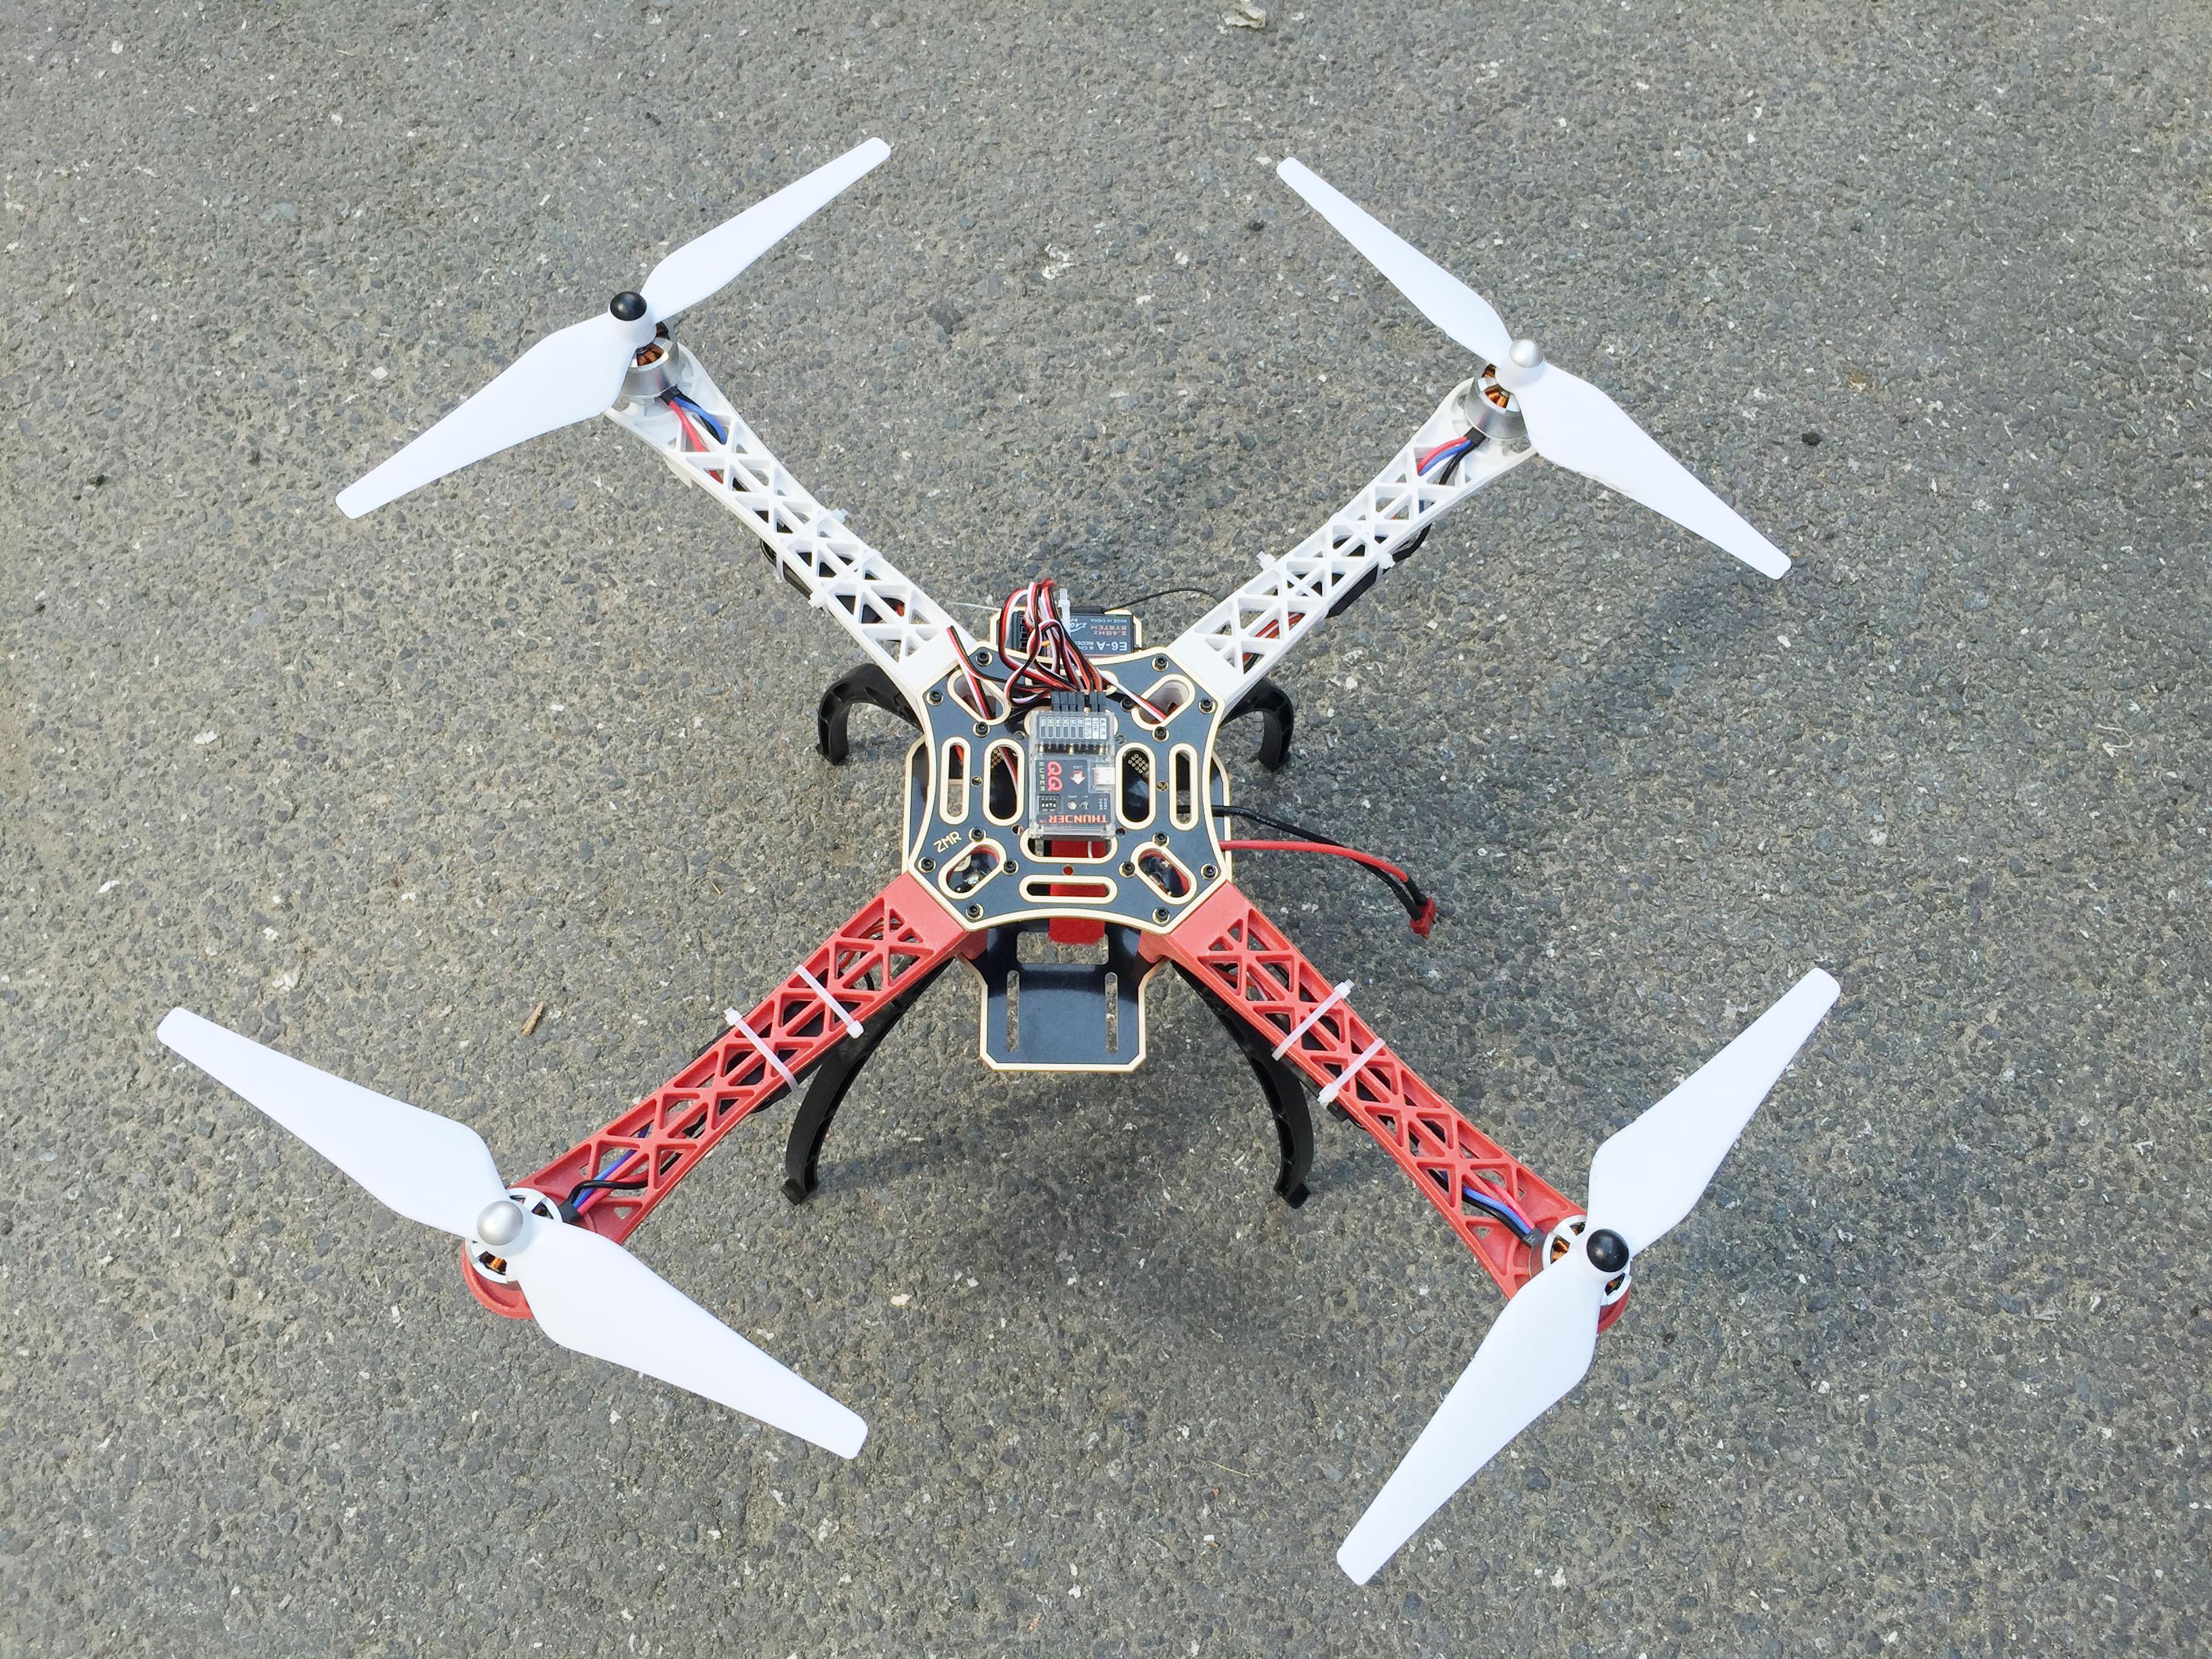 Kit Drone Aerops F450 quadrirotor avec 2212 moteurs 920kV Emax 30A ESC accessoires Naze32 FSi6 déassembler